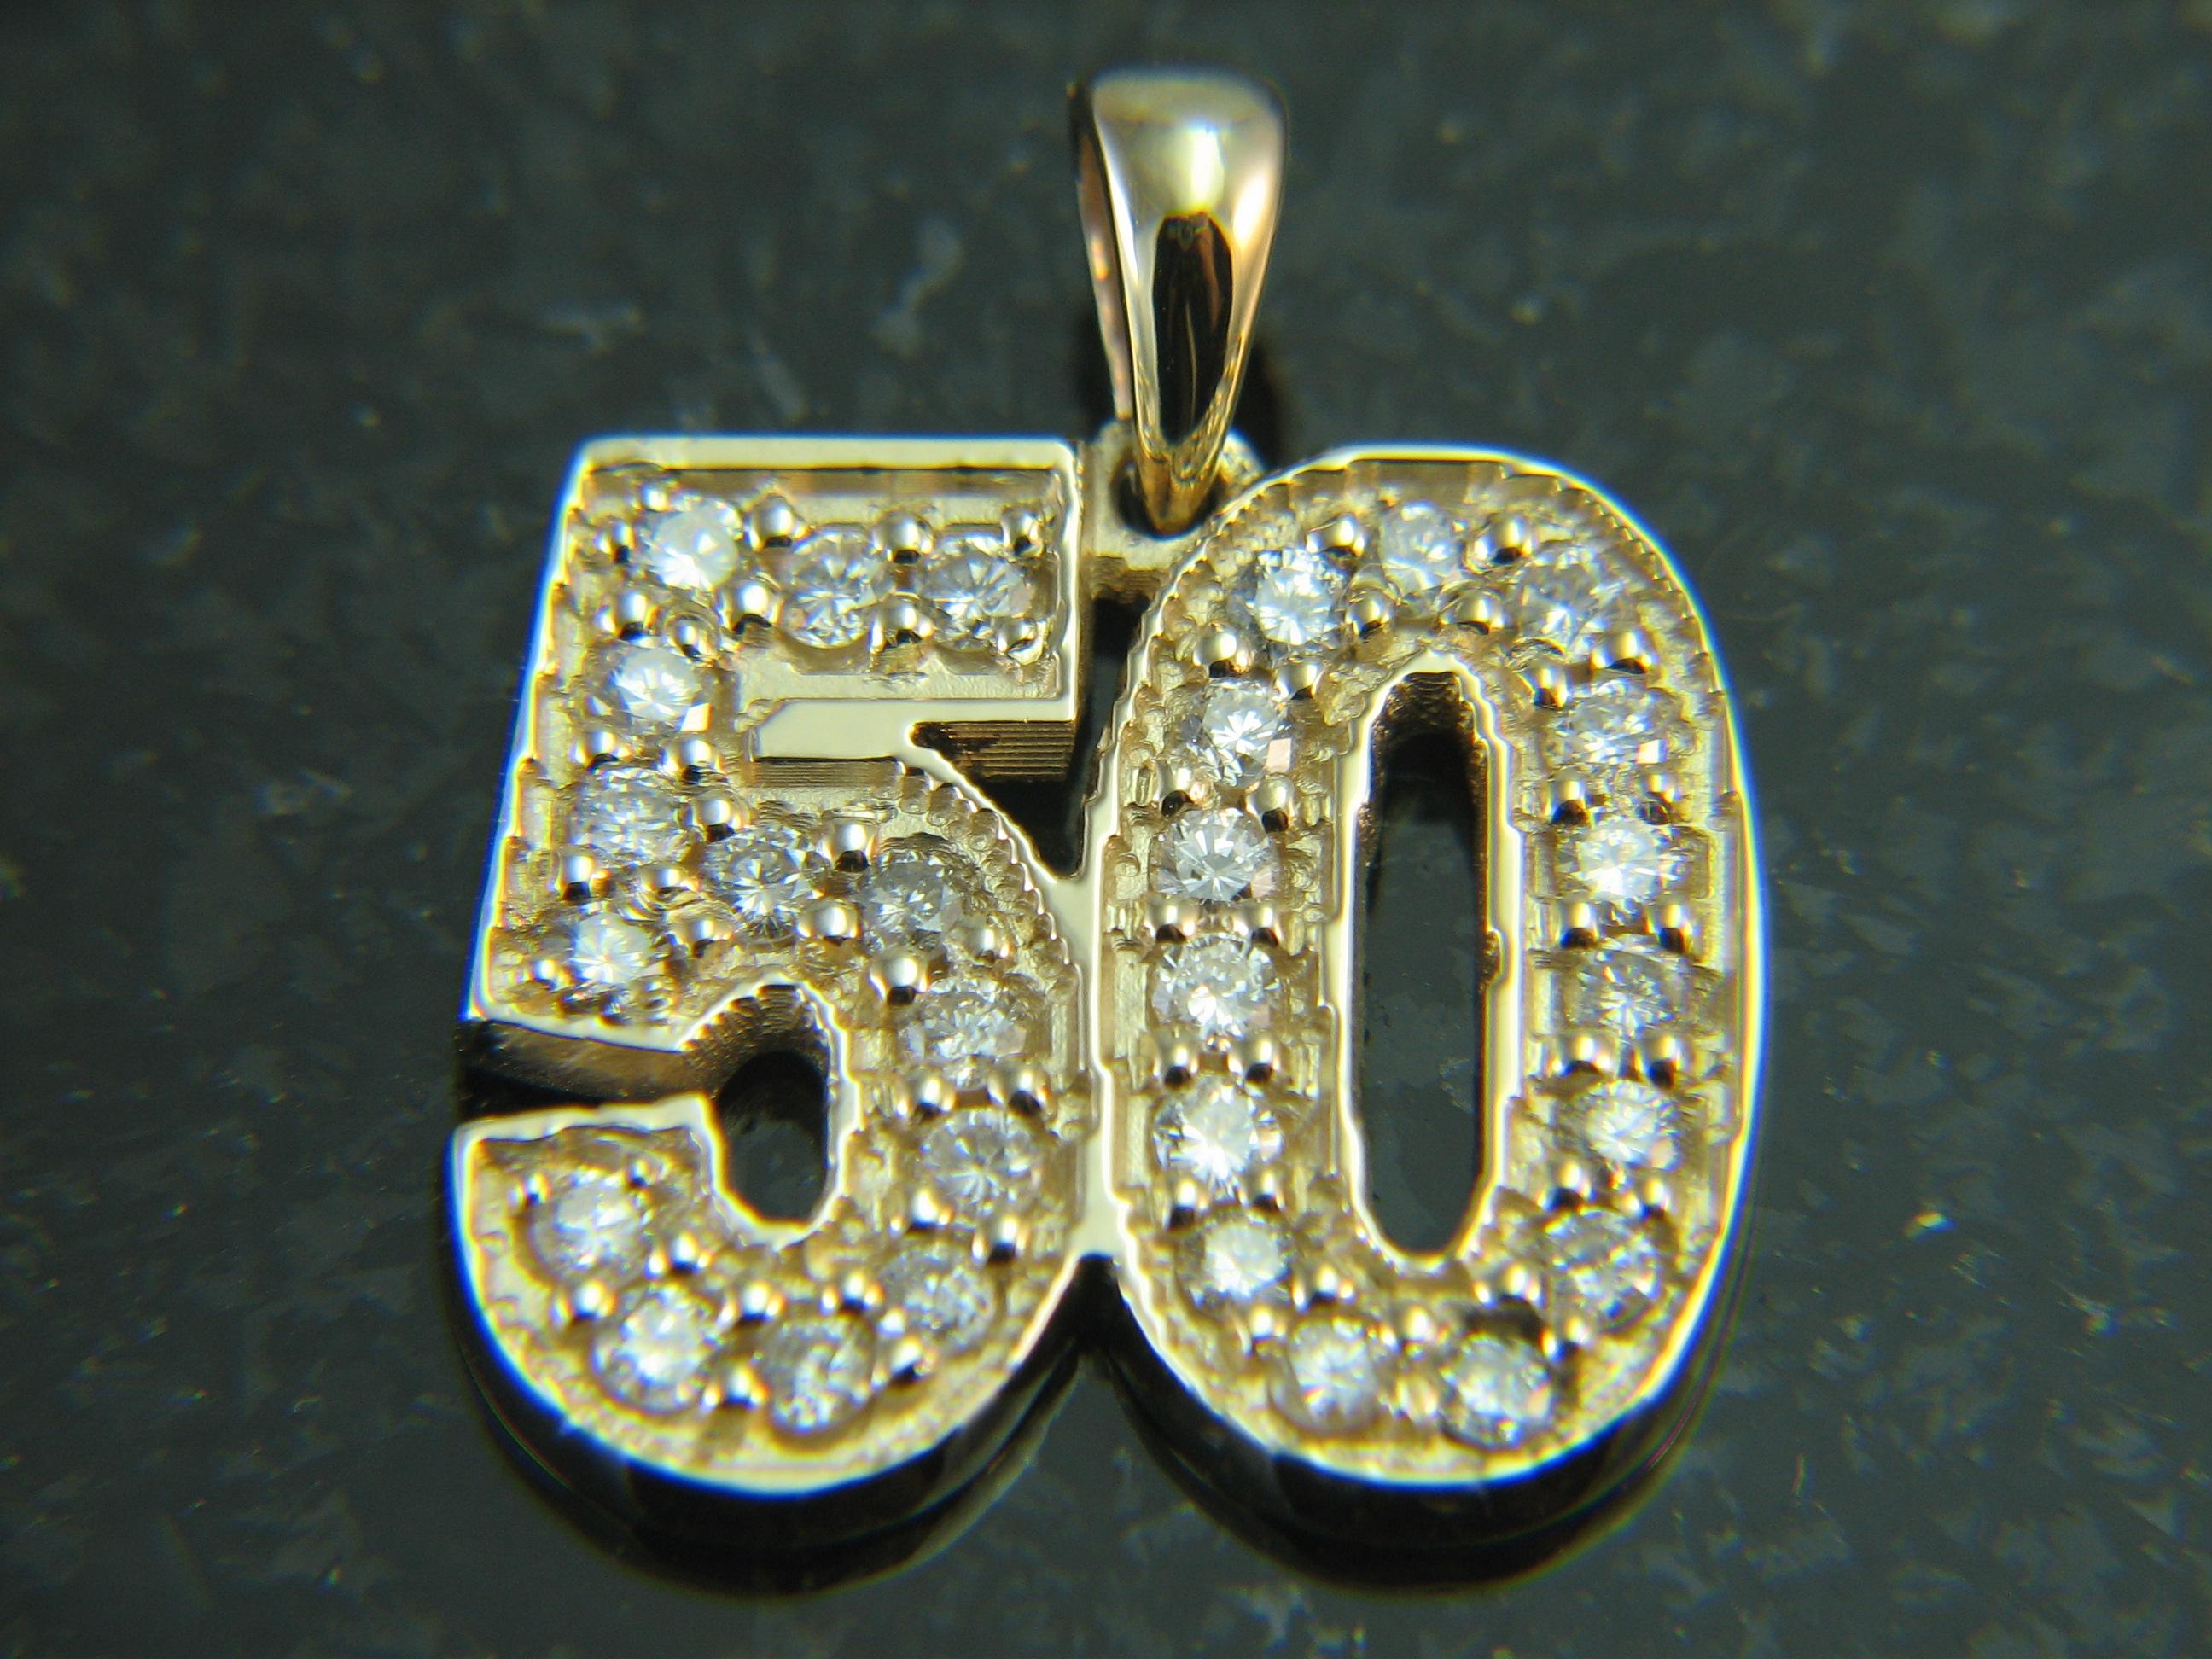 Custom Designed Jewelry By Mansfield Designs